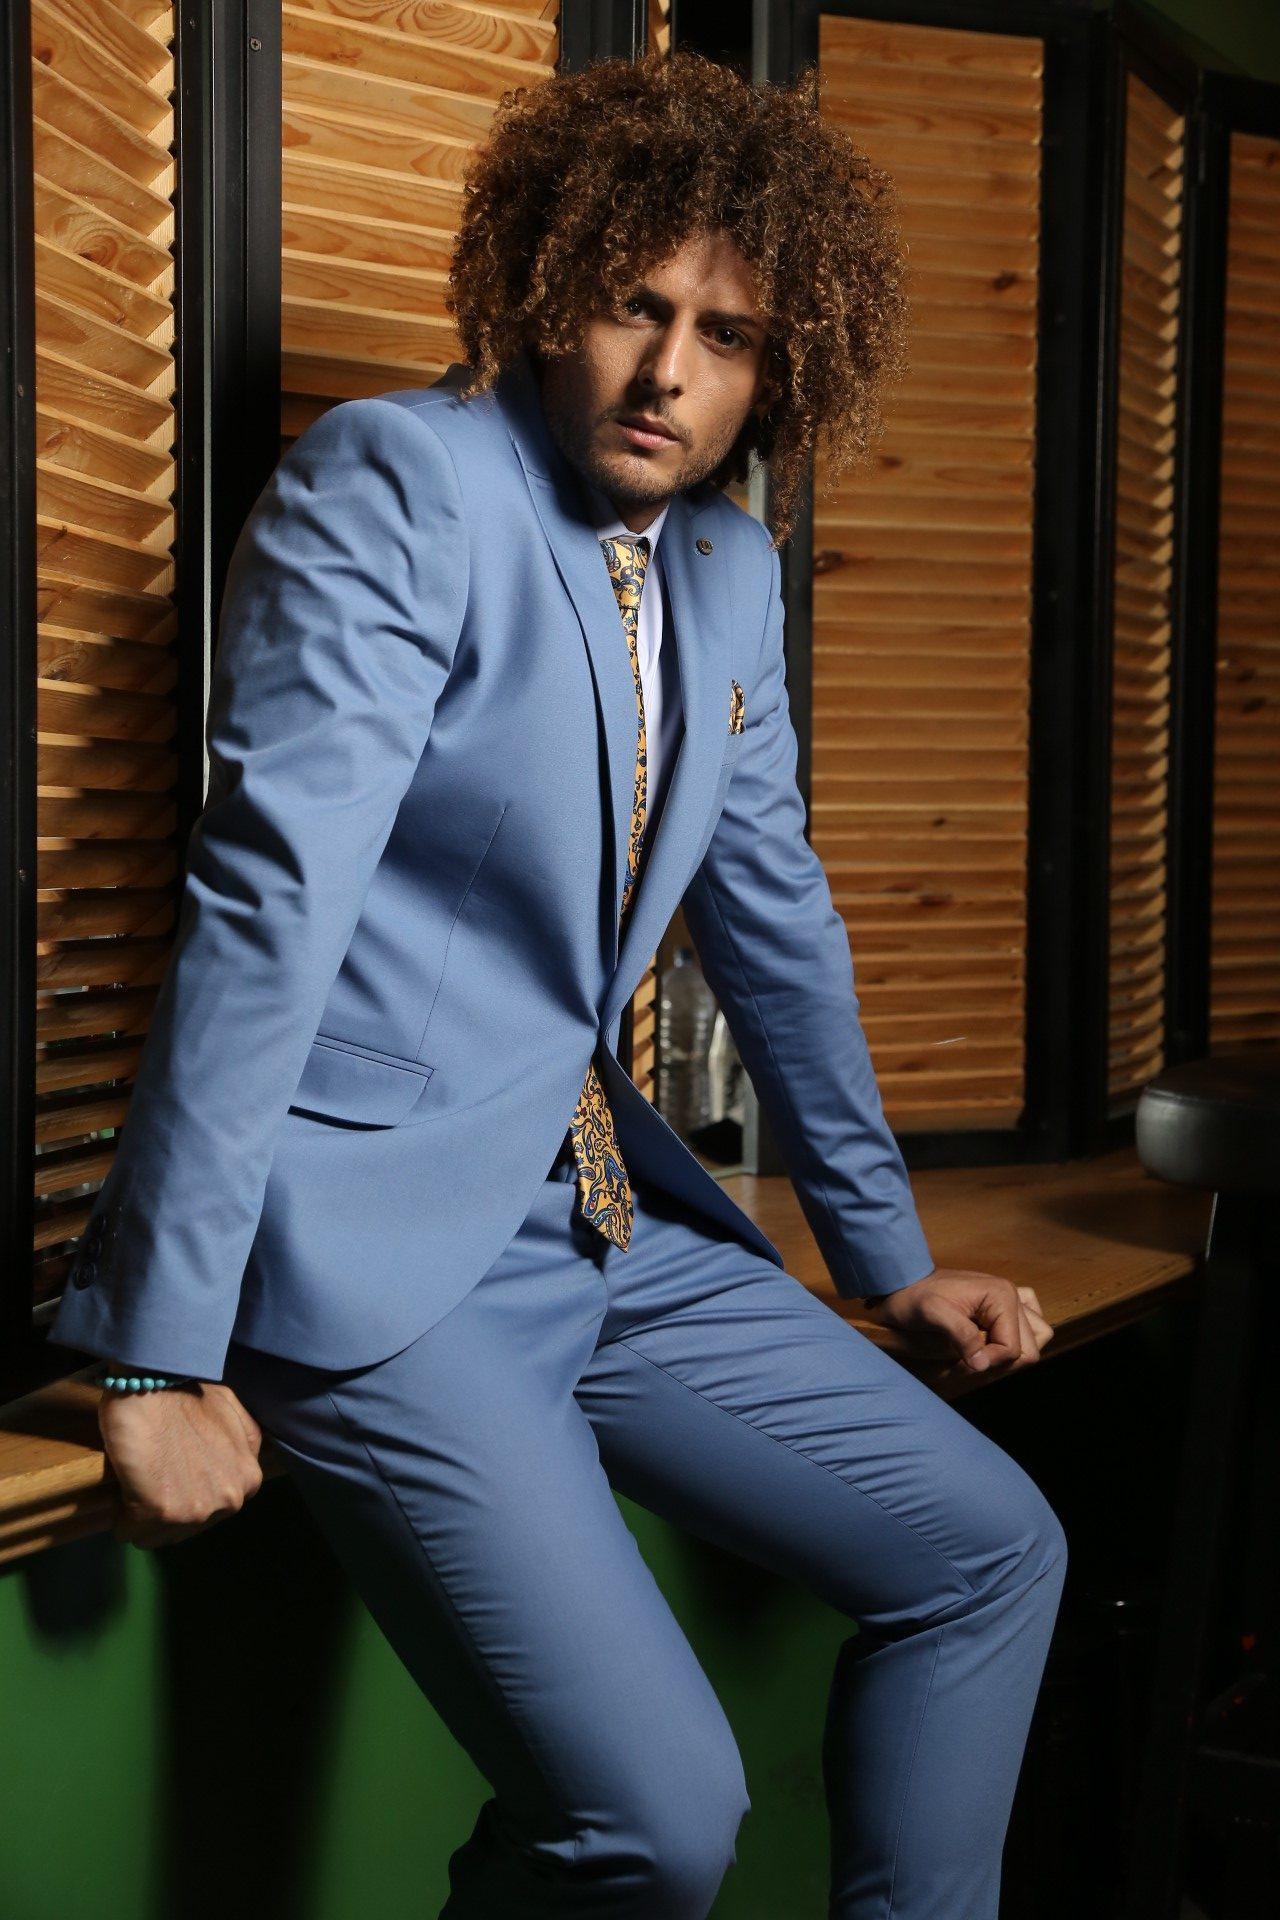 Diplomat-Groom-Suits (4)